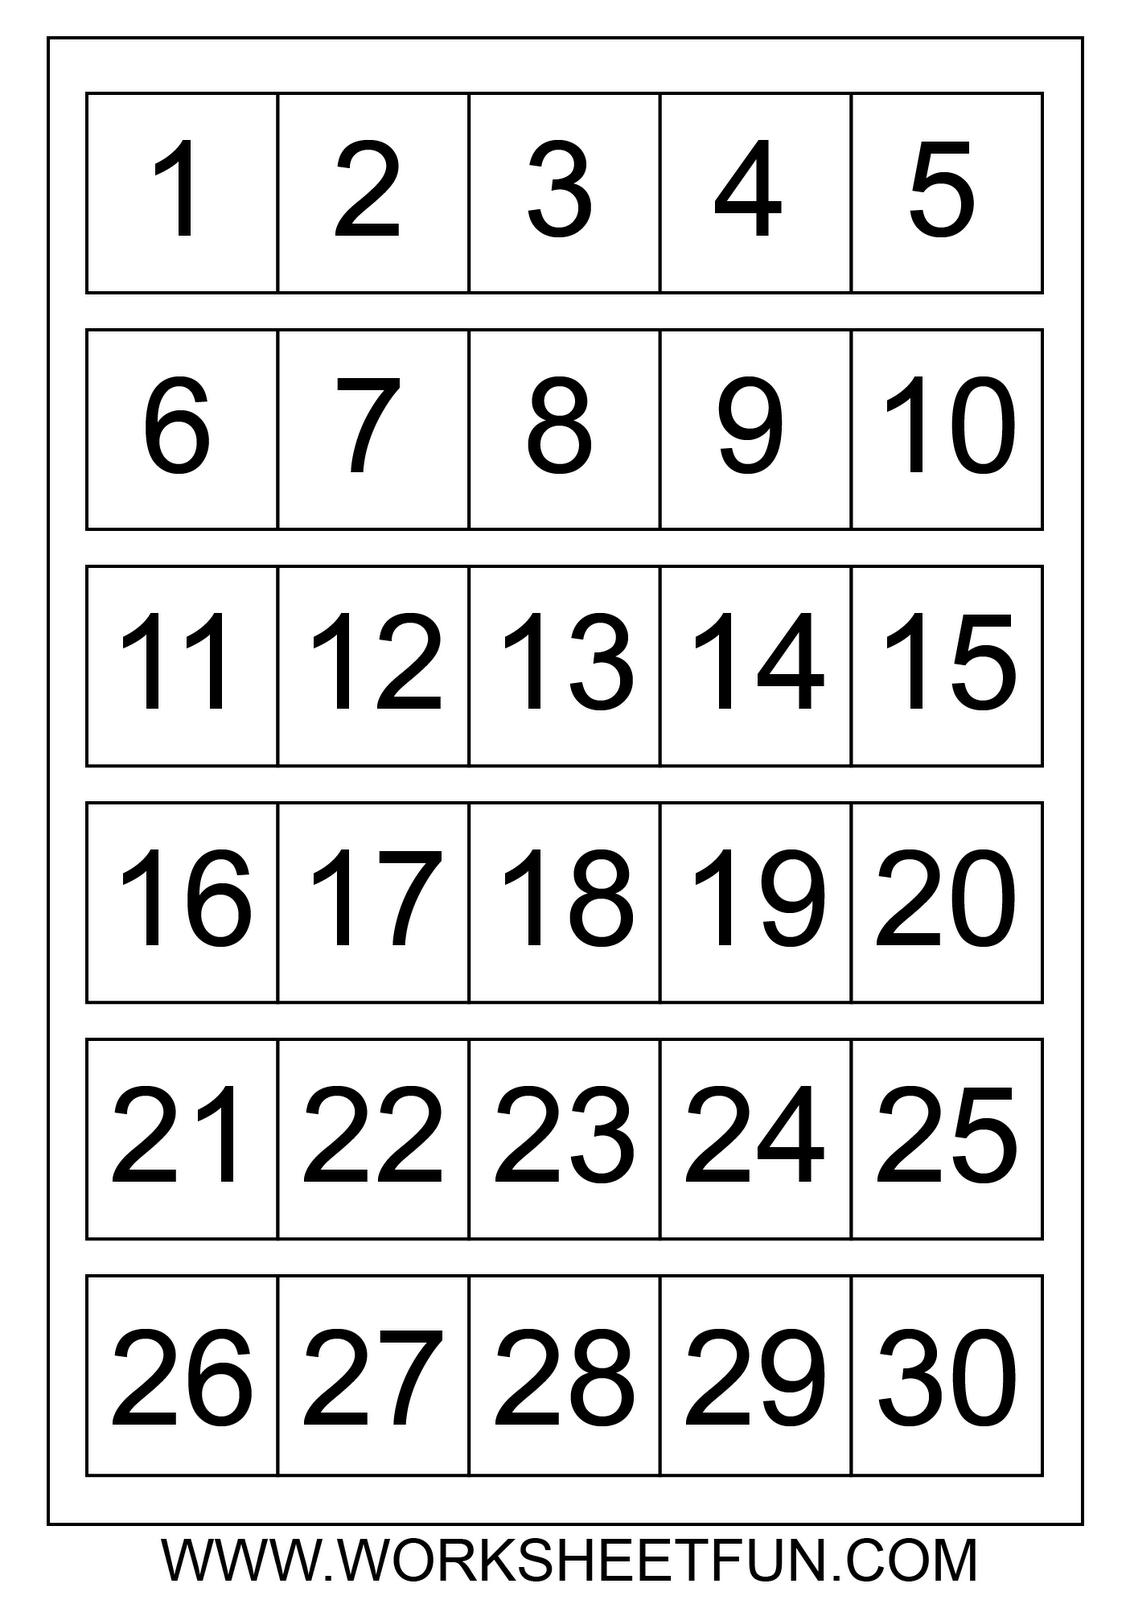 Calendar To Print For Bills - Calendar Inspiration Design